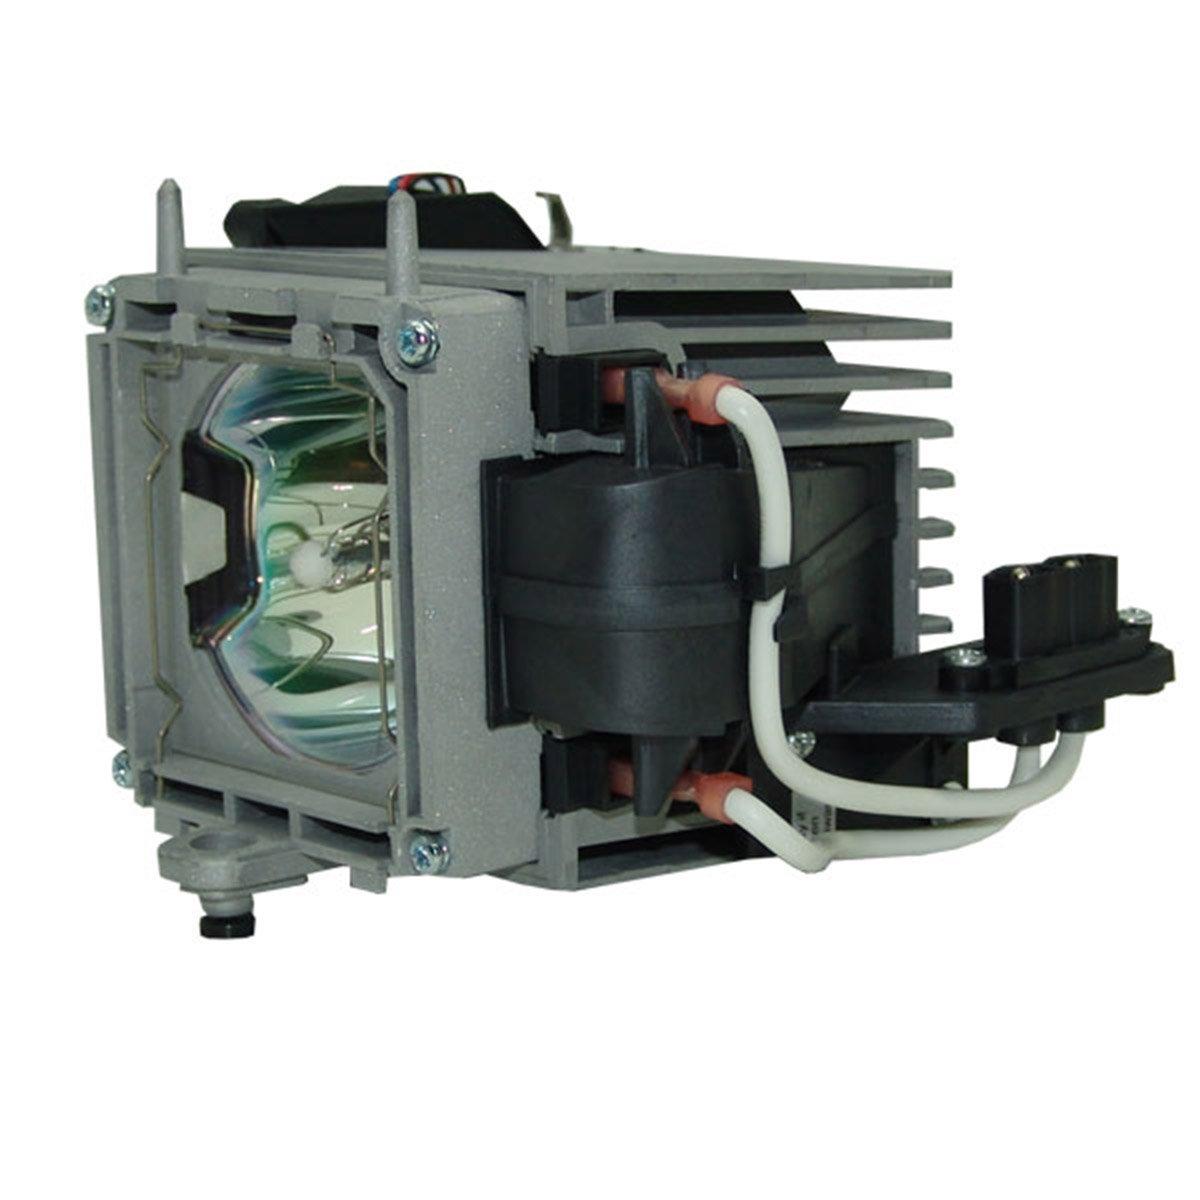 Lutema SP-LAMP-006-L01-3 Ask Proxima SP-LAMP-006 LCD/DLP Projector Lamp (Economy)